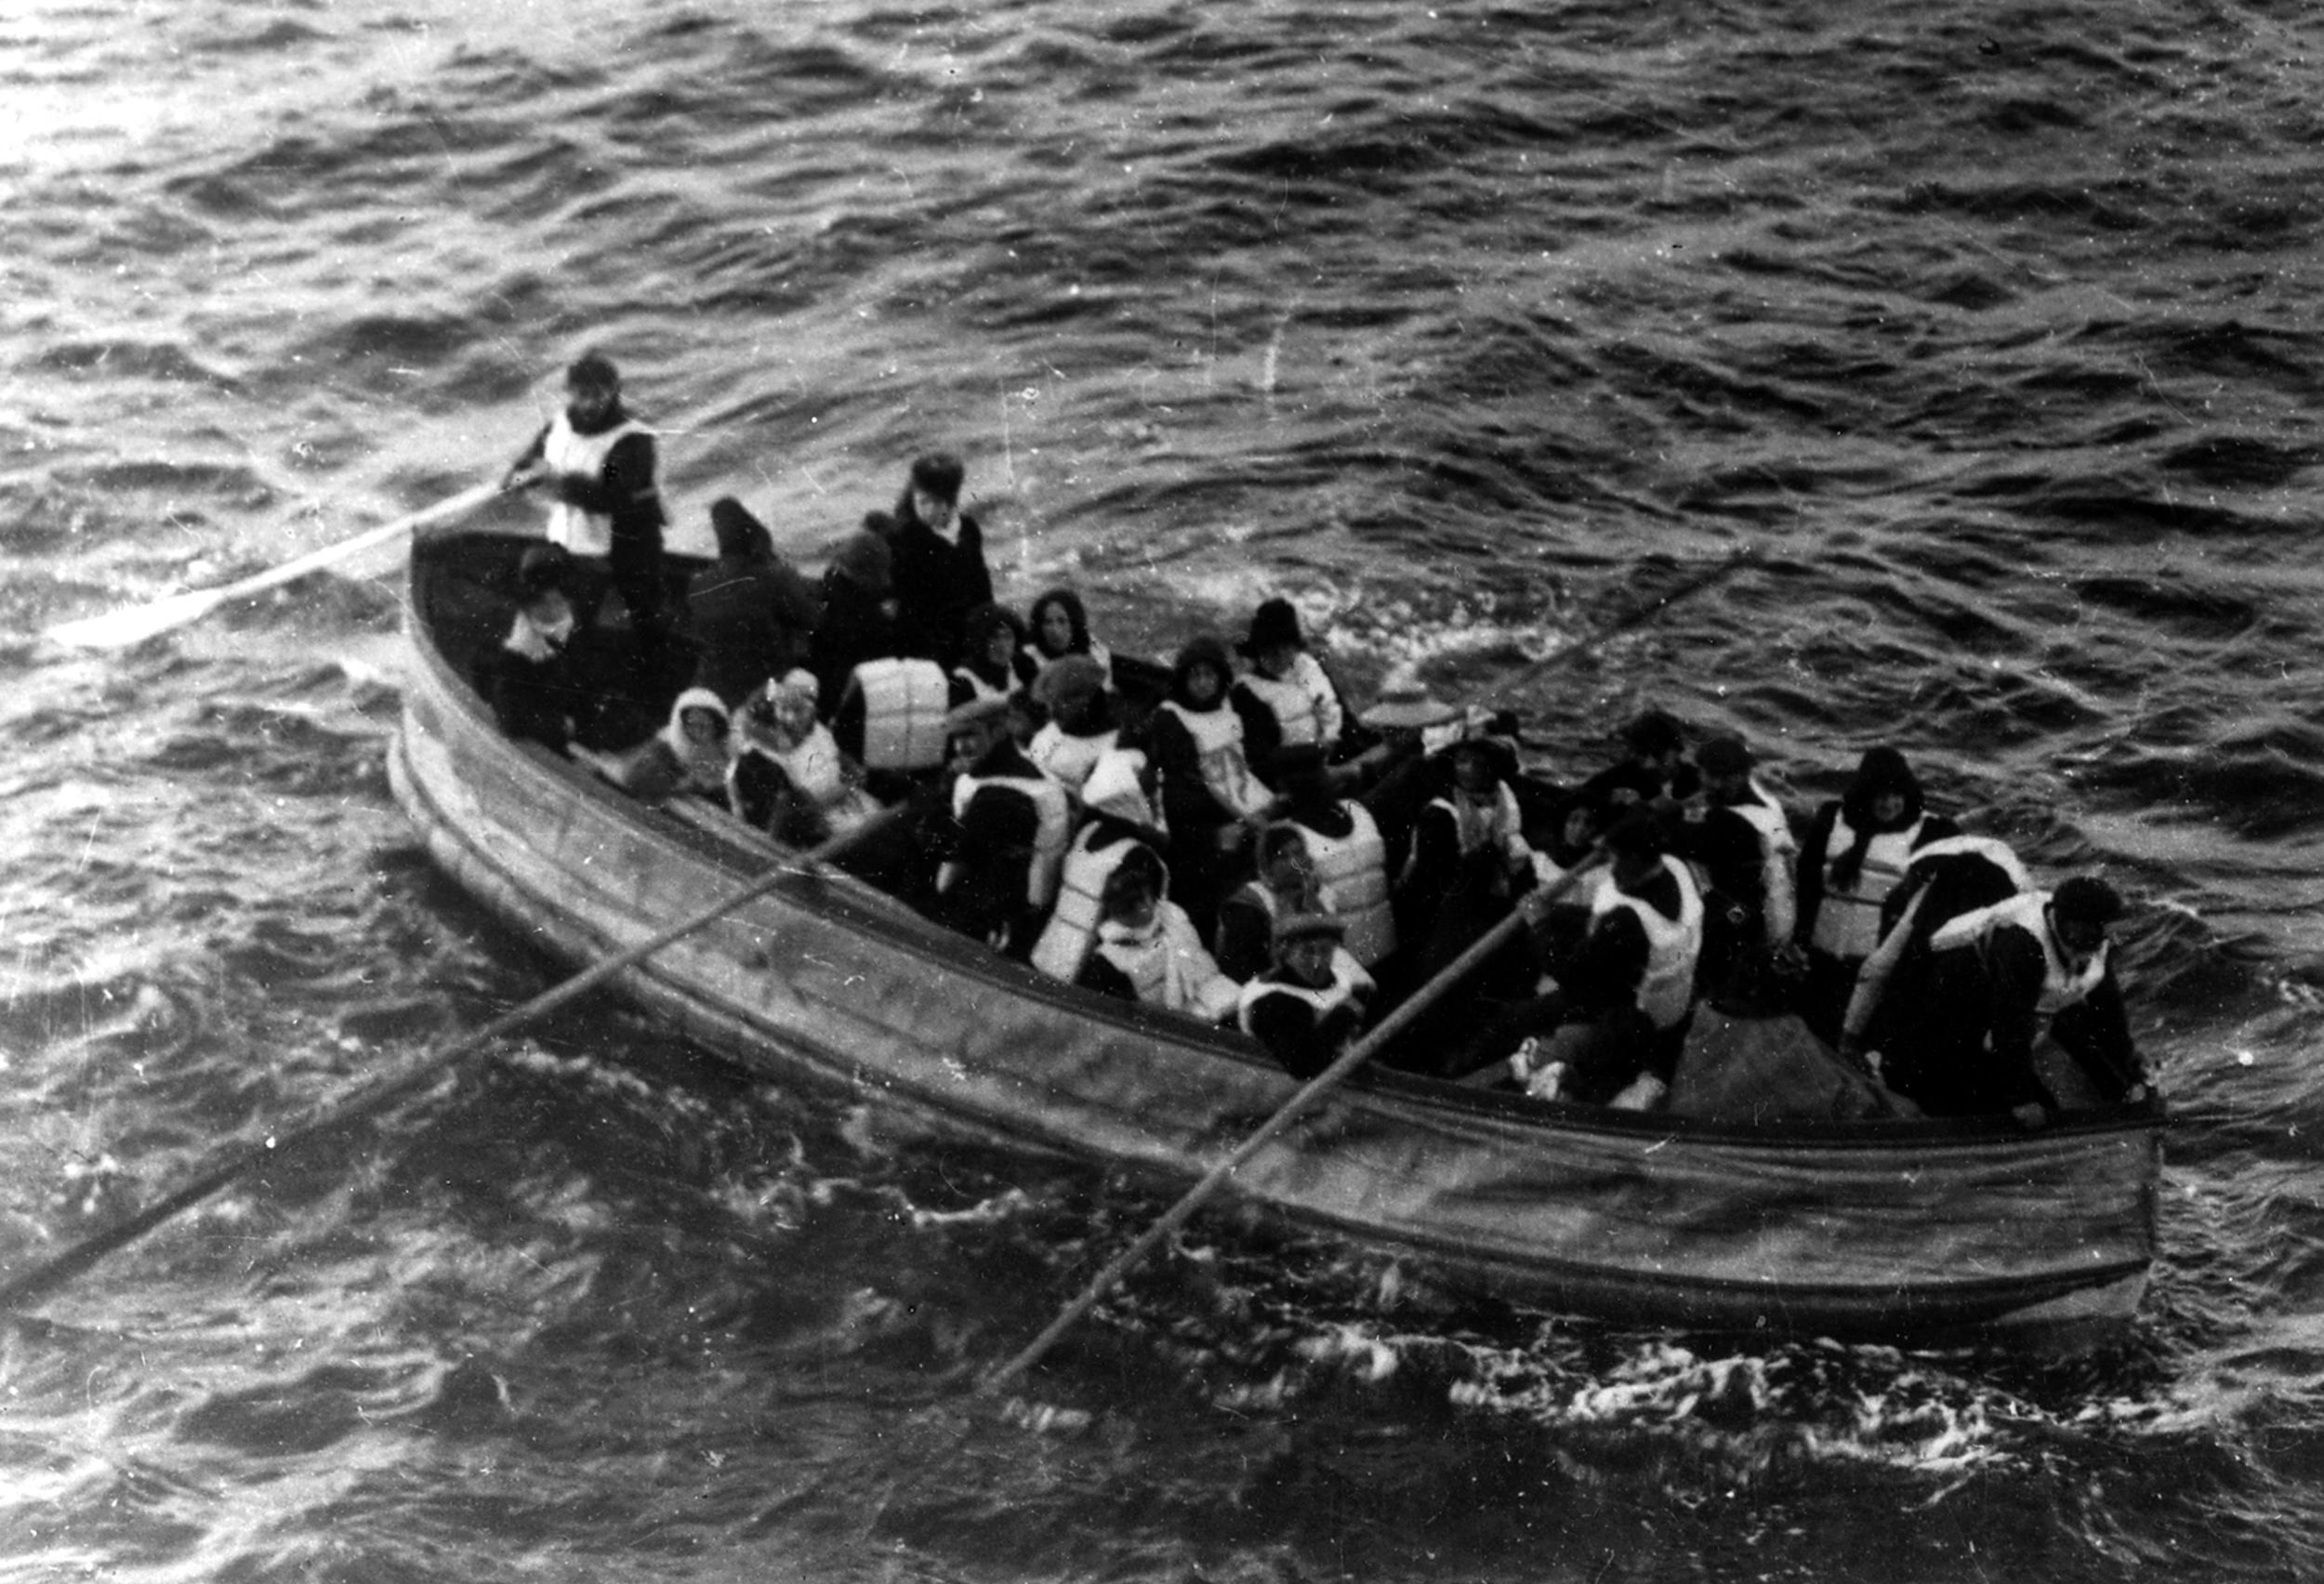 Titanic_lifeboat.jpg